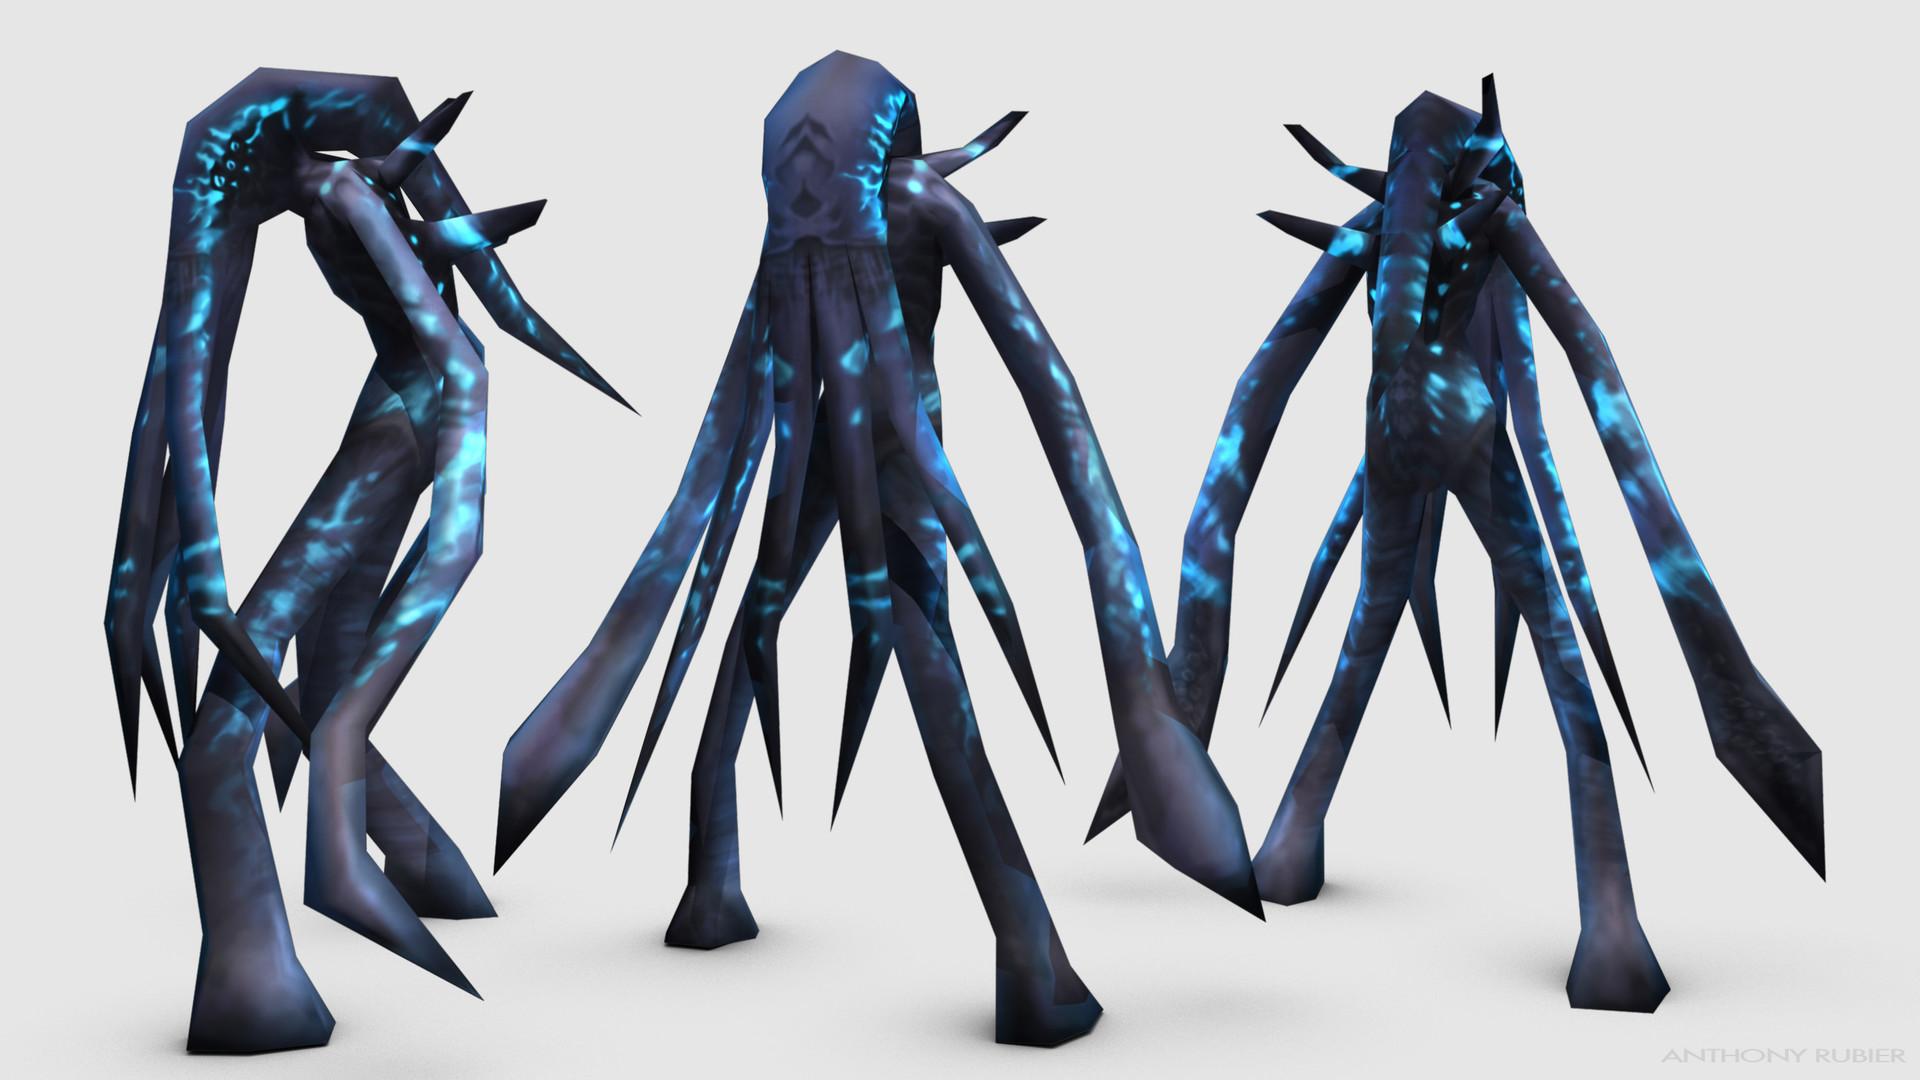 ArtStation - Cosmic Cephalopod, Anthony Rubier